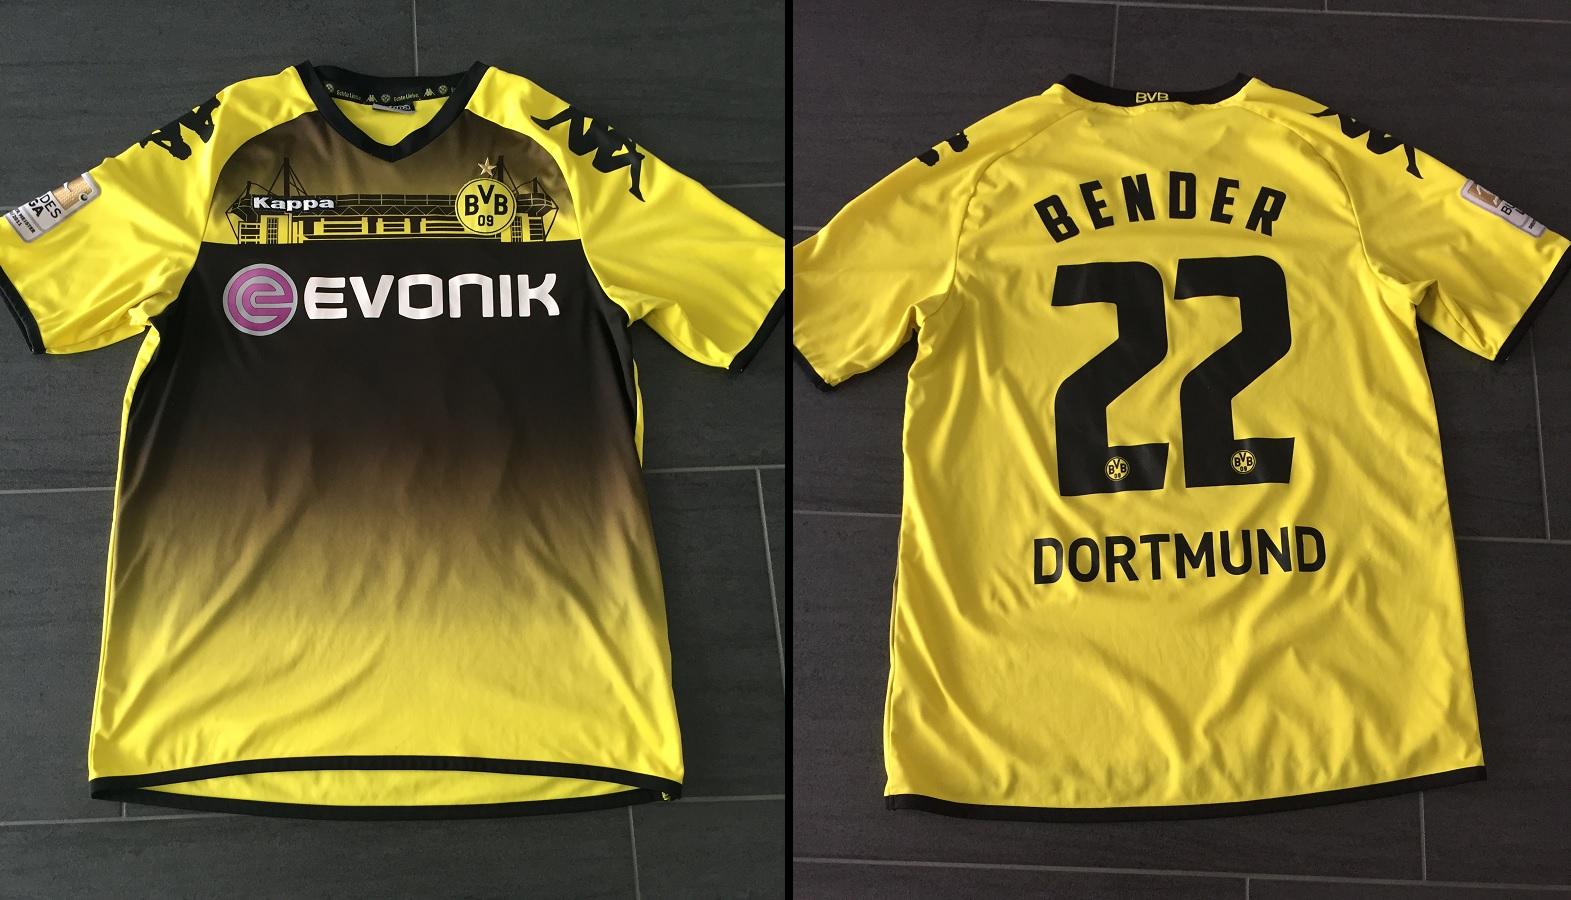 Borussia Dortmund X-mas 2011/12 Bender